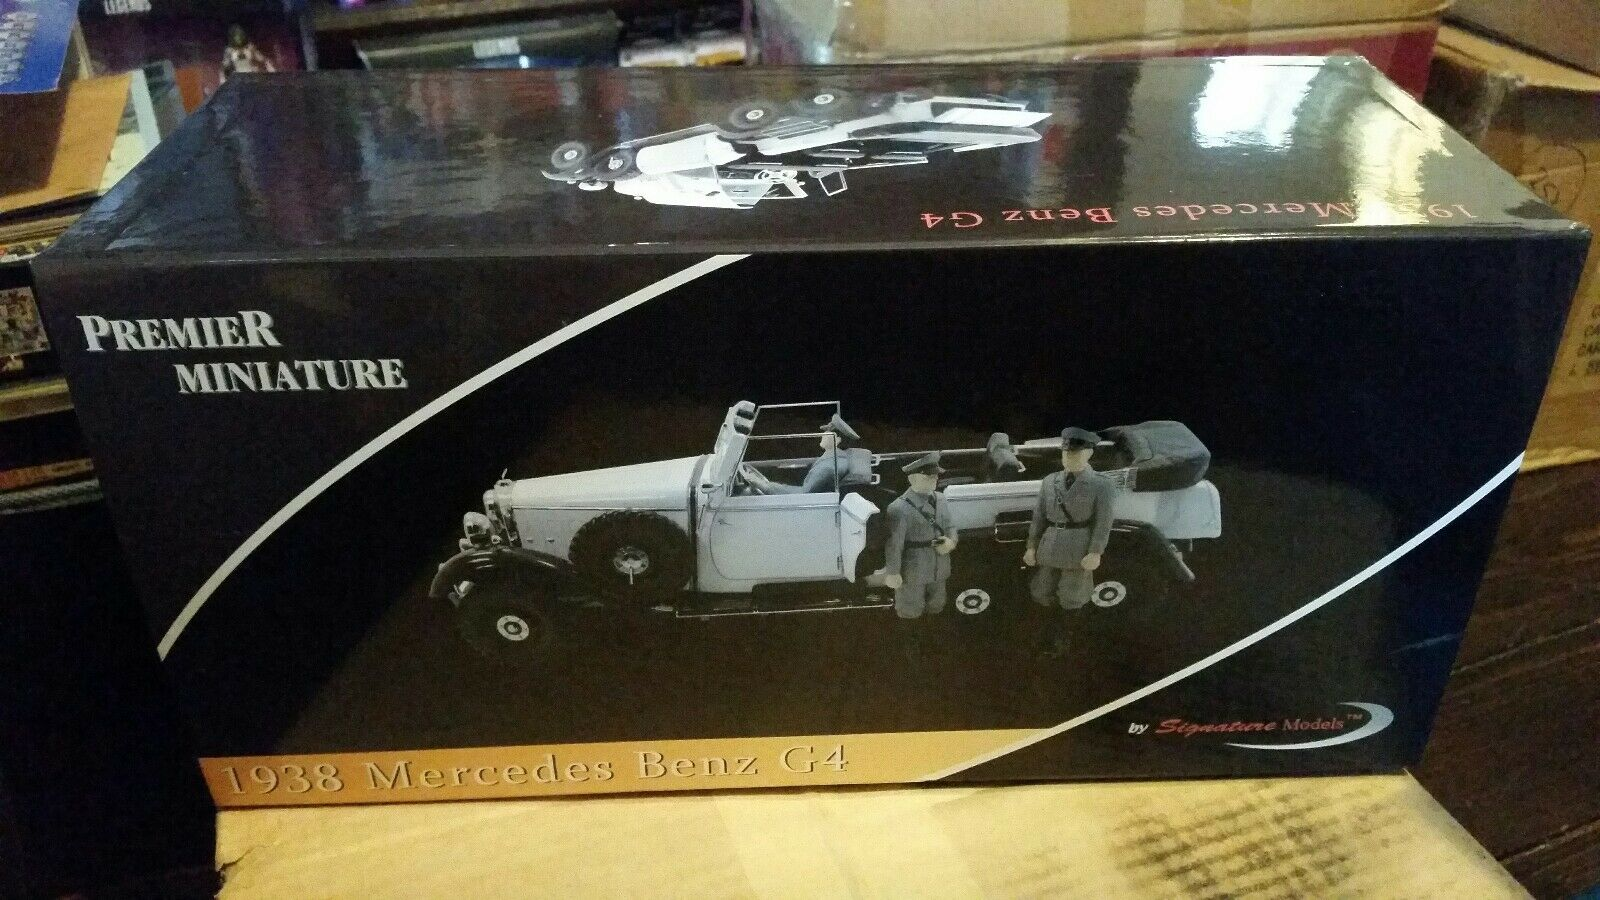 Signature Models Premier Miniature 1 18 Scale Diecast 1938 Mercedes Benz G4 MIB